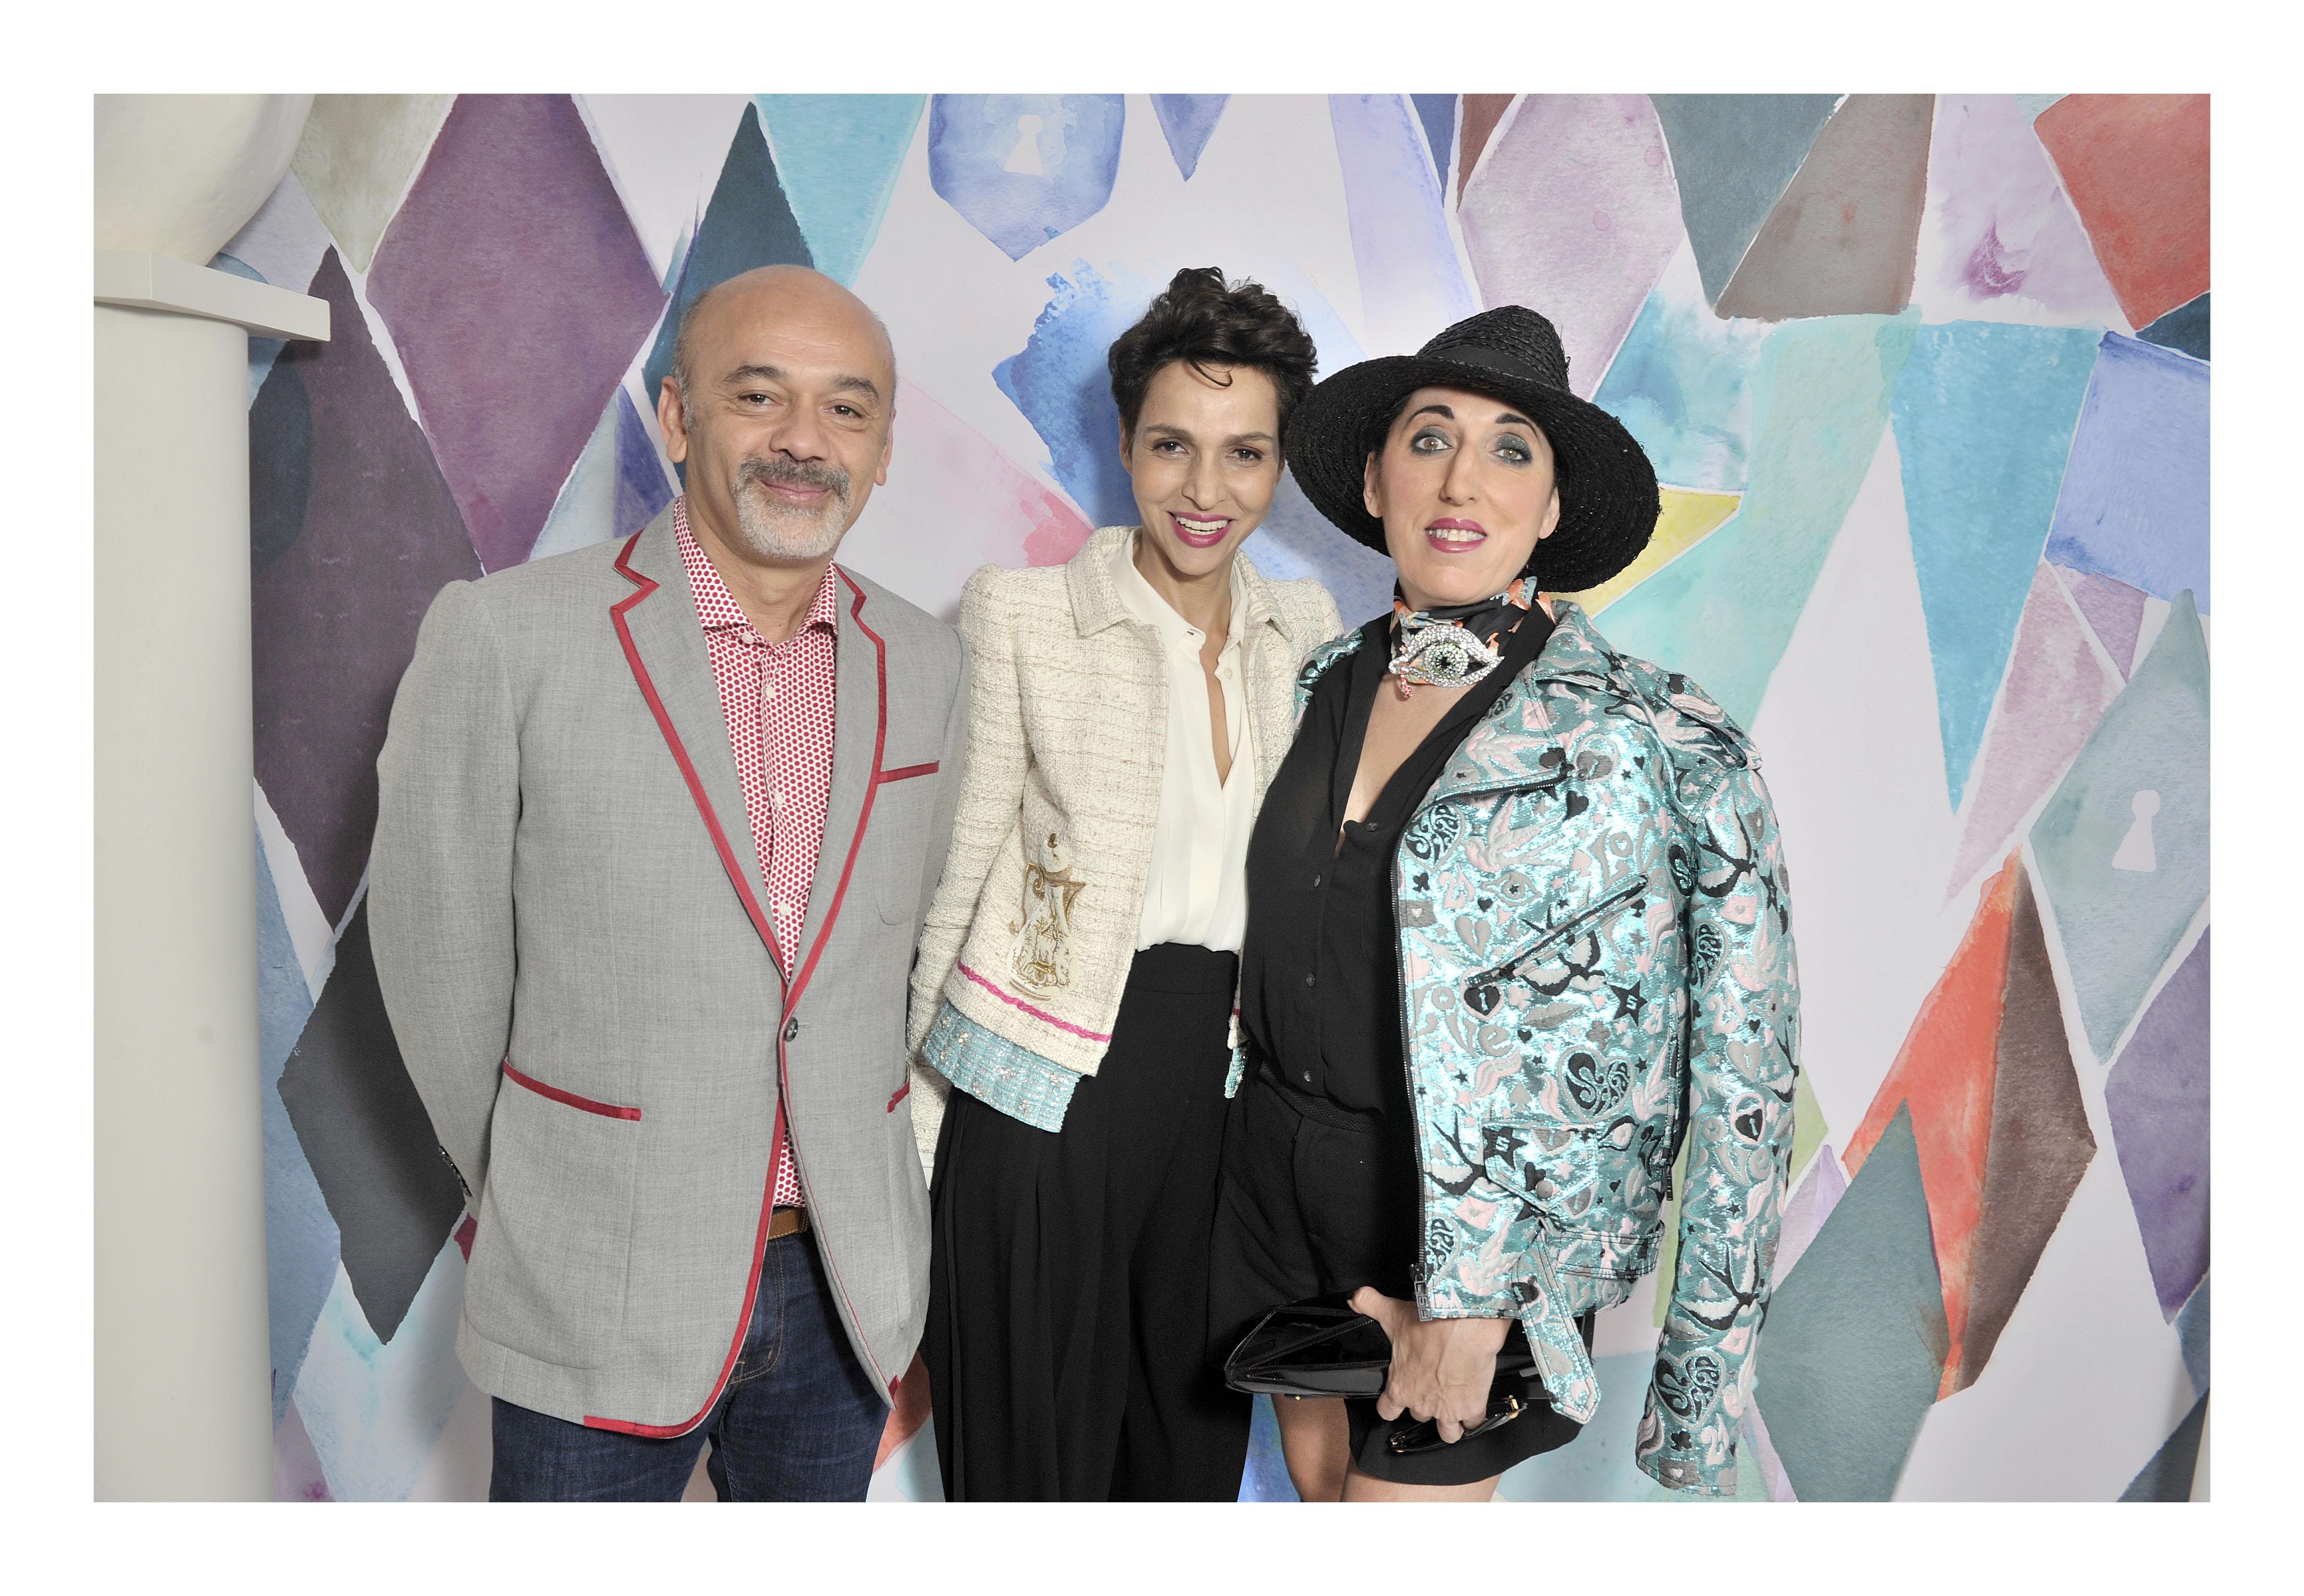 Christian Louboutin, Farida Khelfa & Rossy de Palma